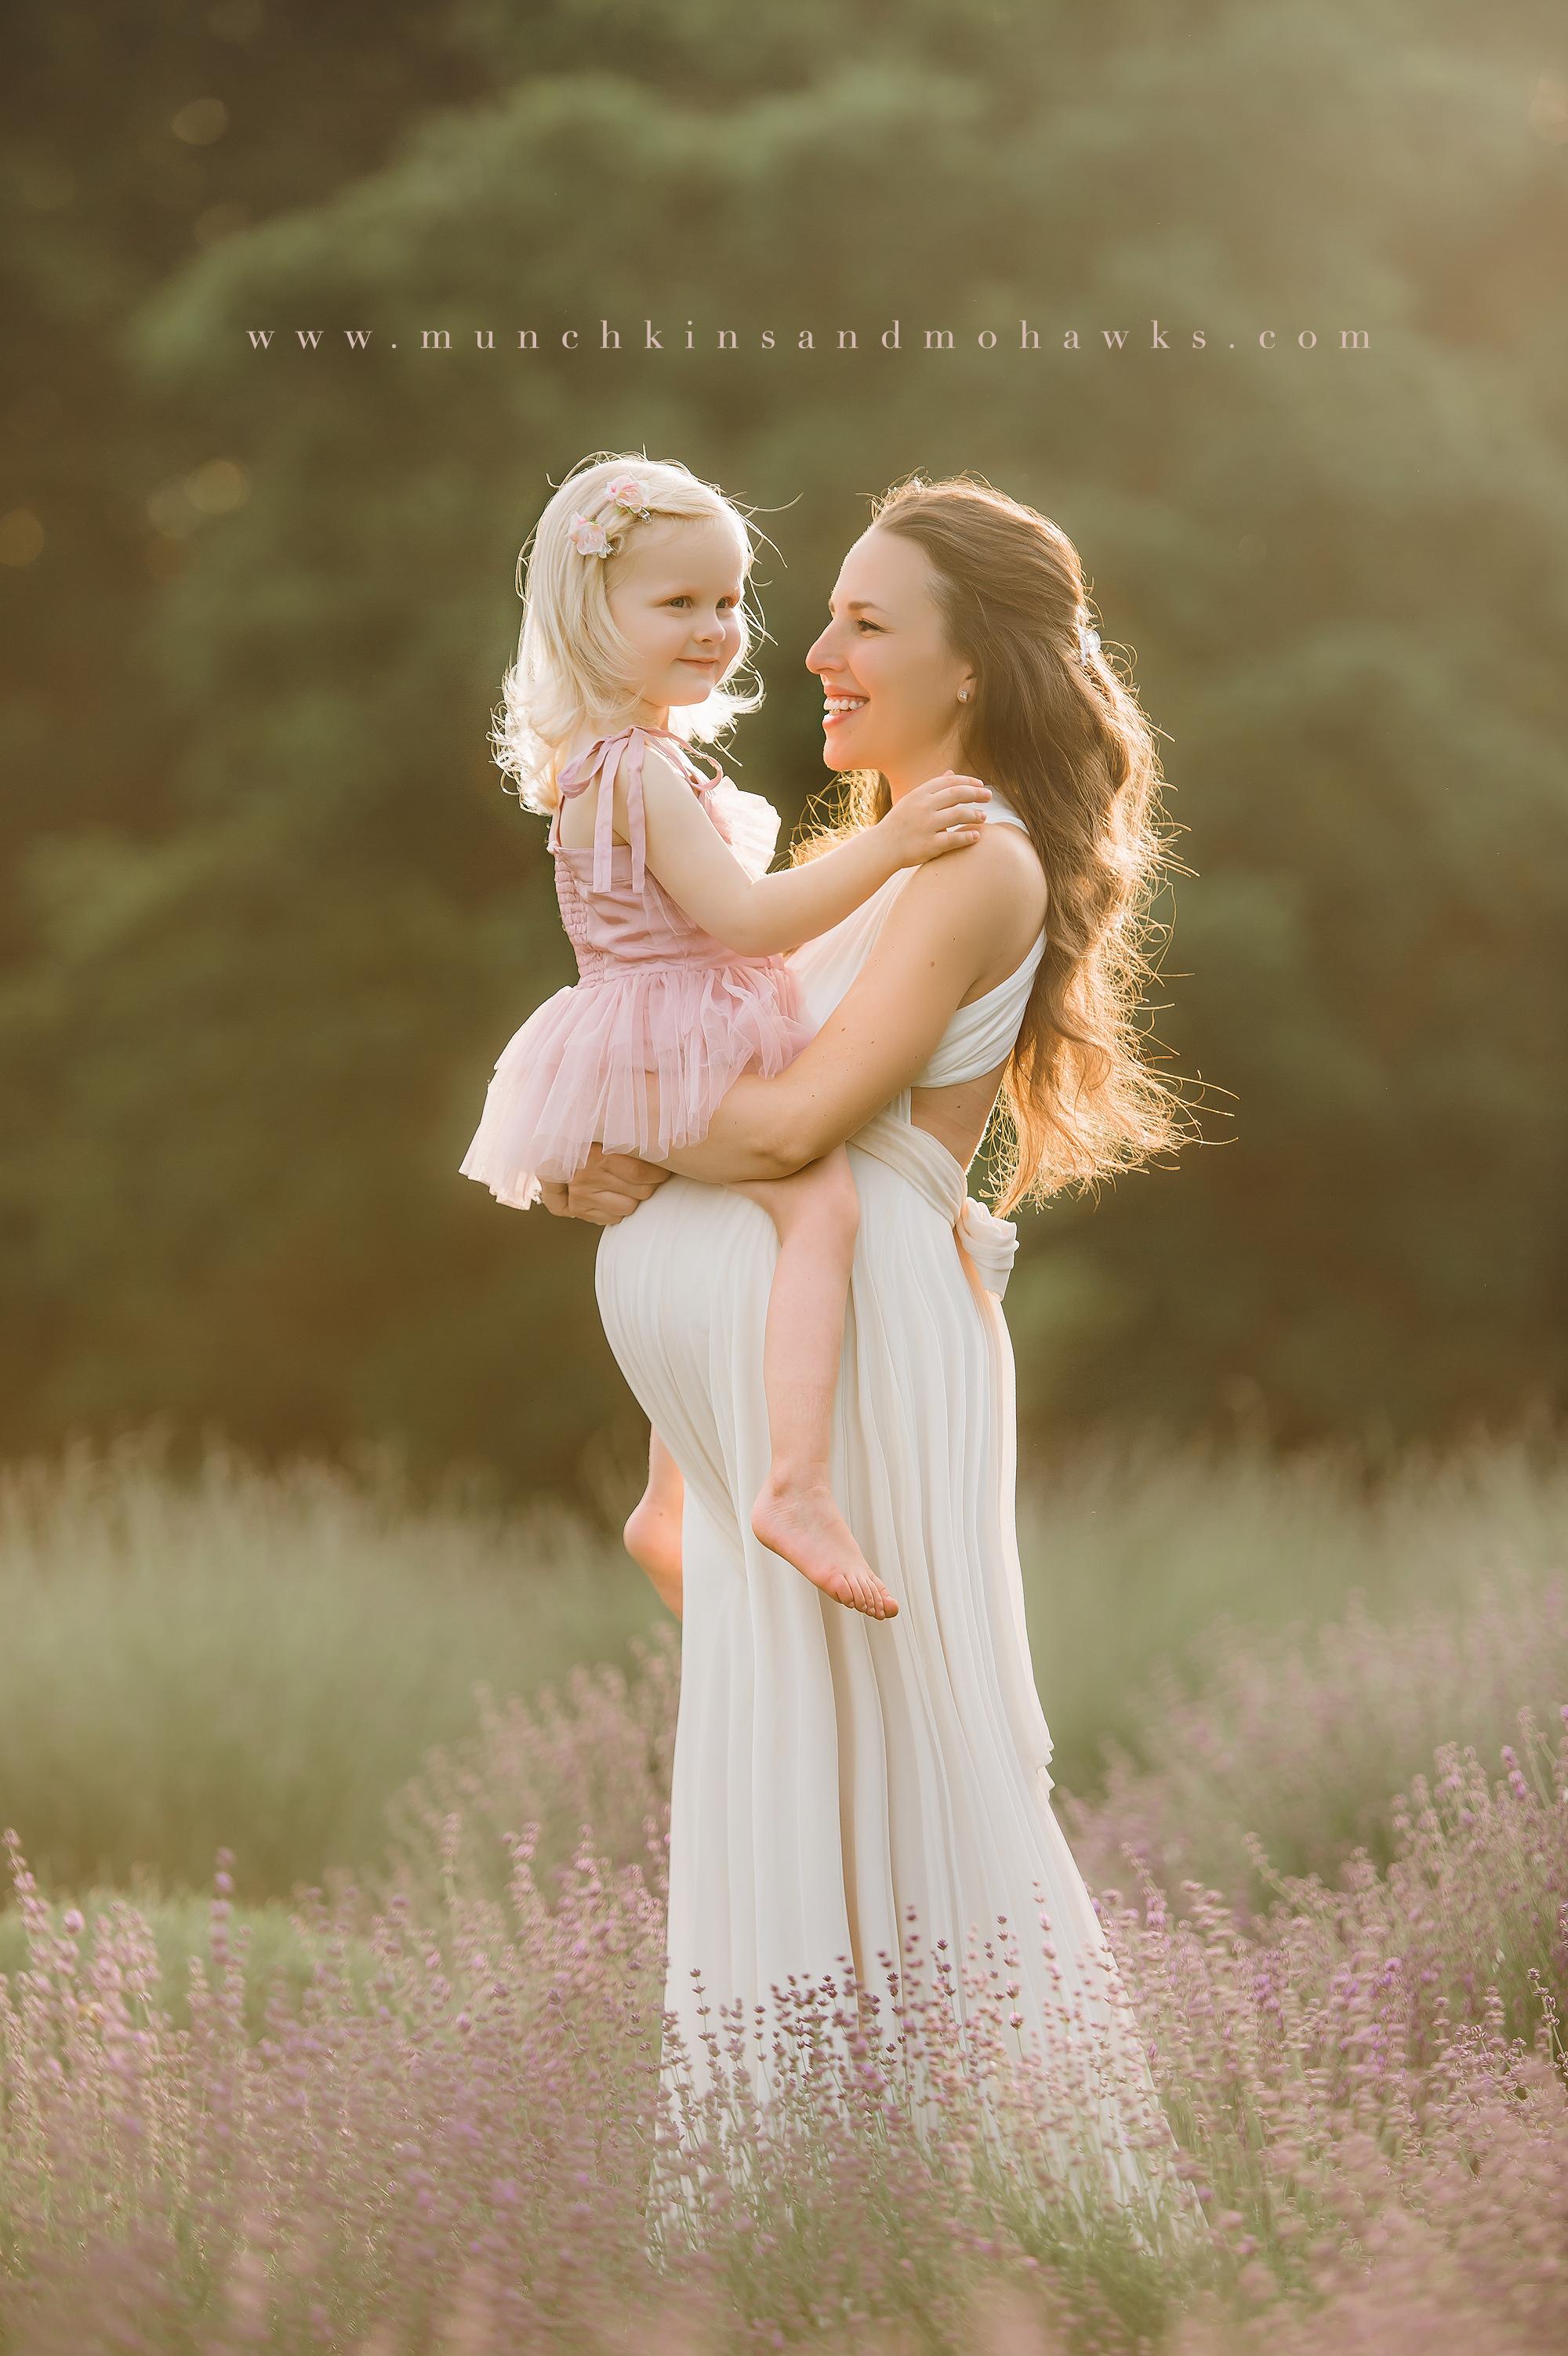 nyc family and maternity photography nyc islanders